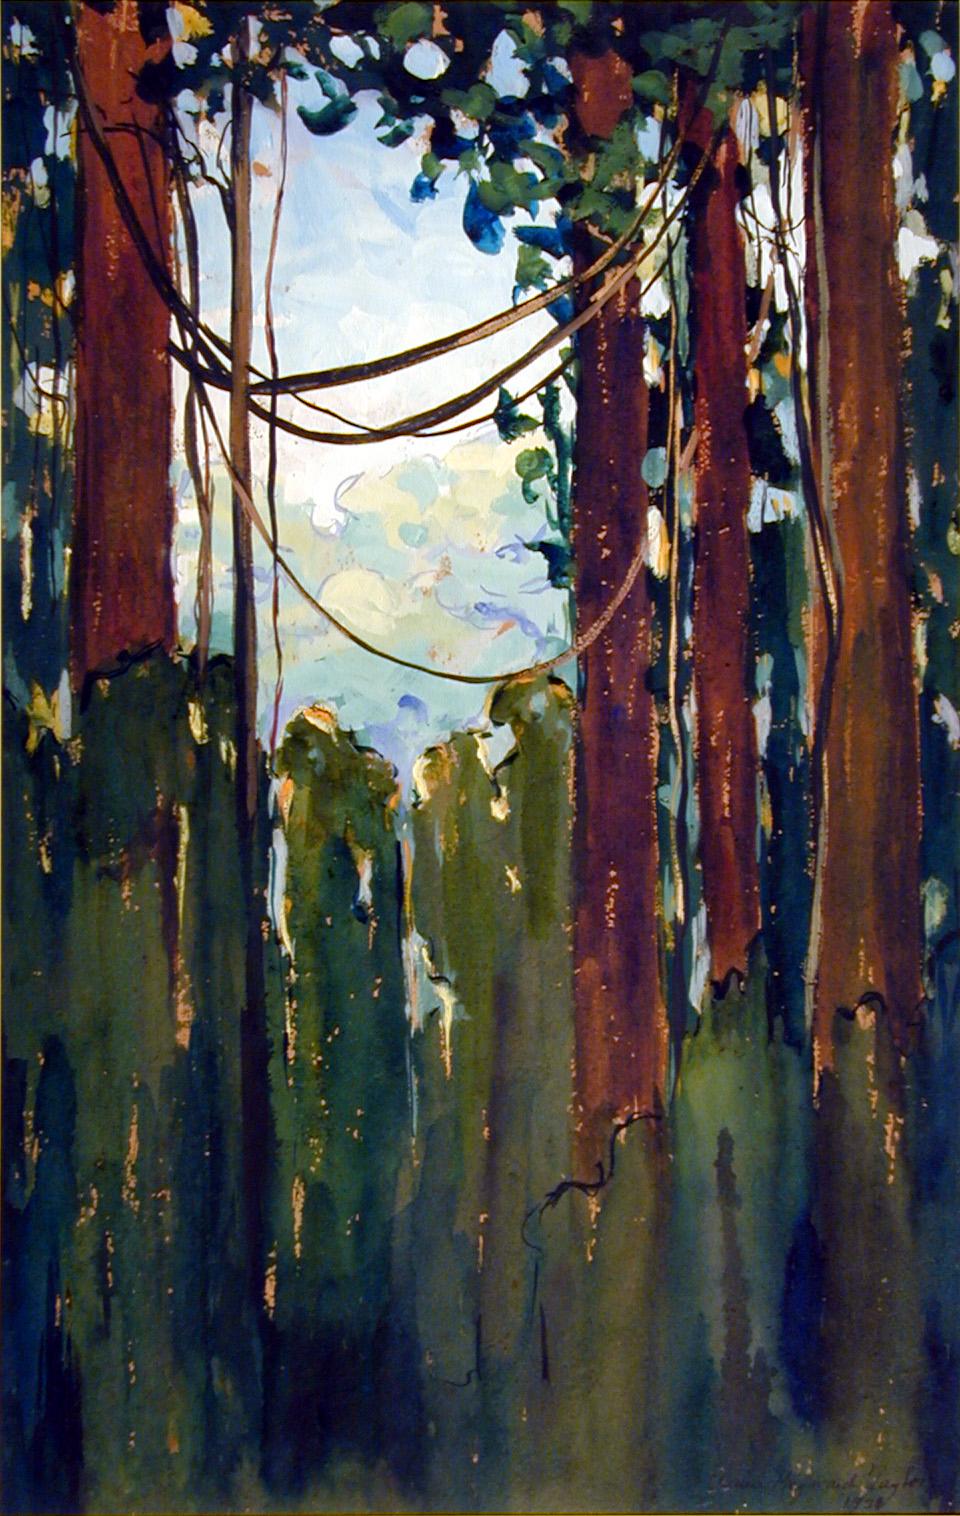 Untitled (Guiana Jungle), 1921, by Anna Heyward Taylor